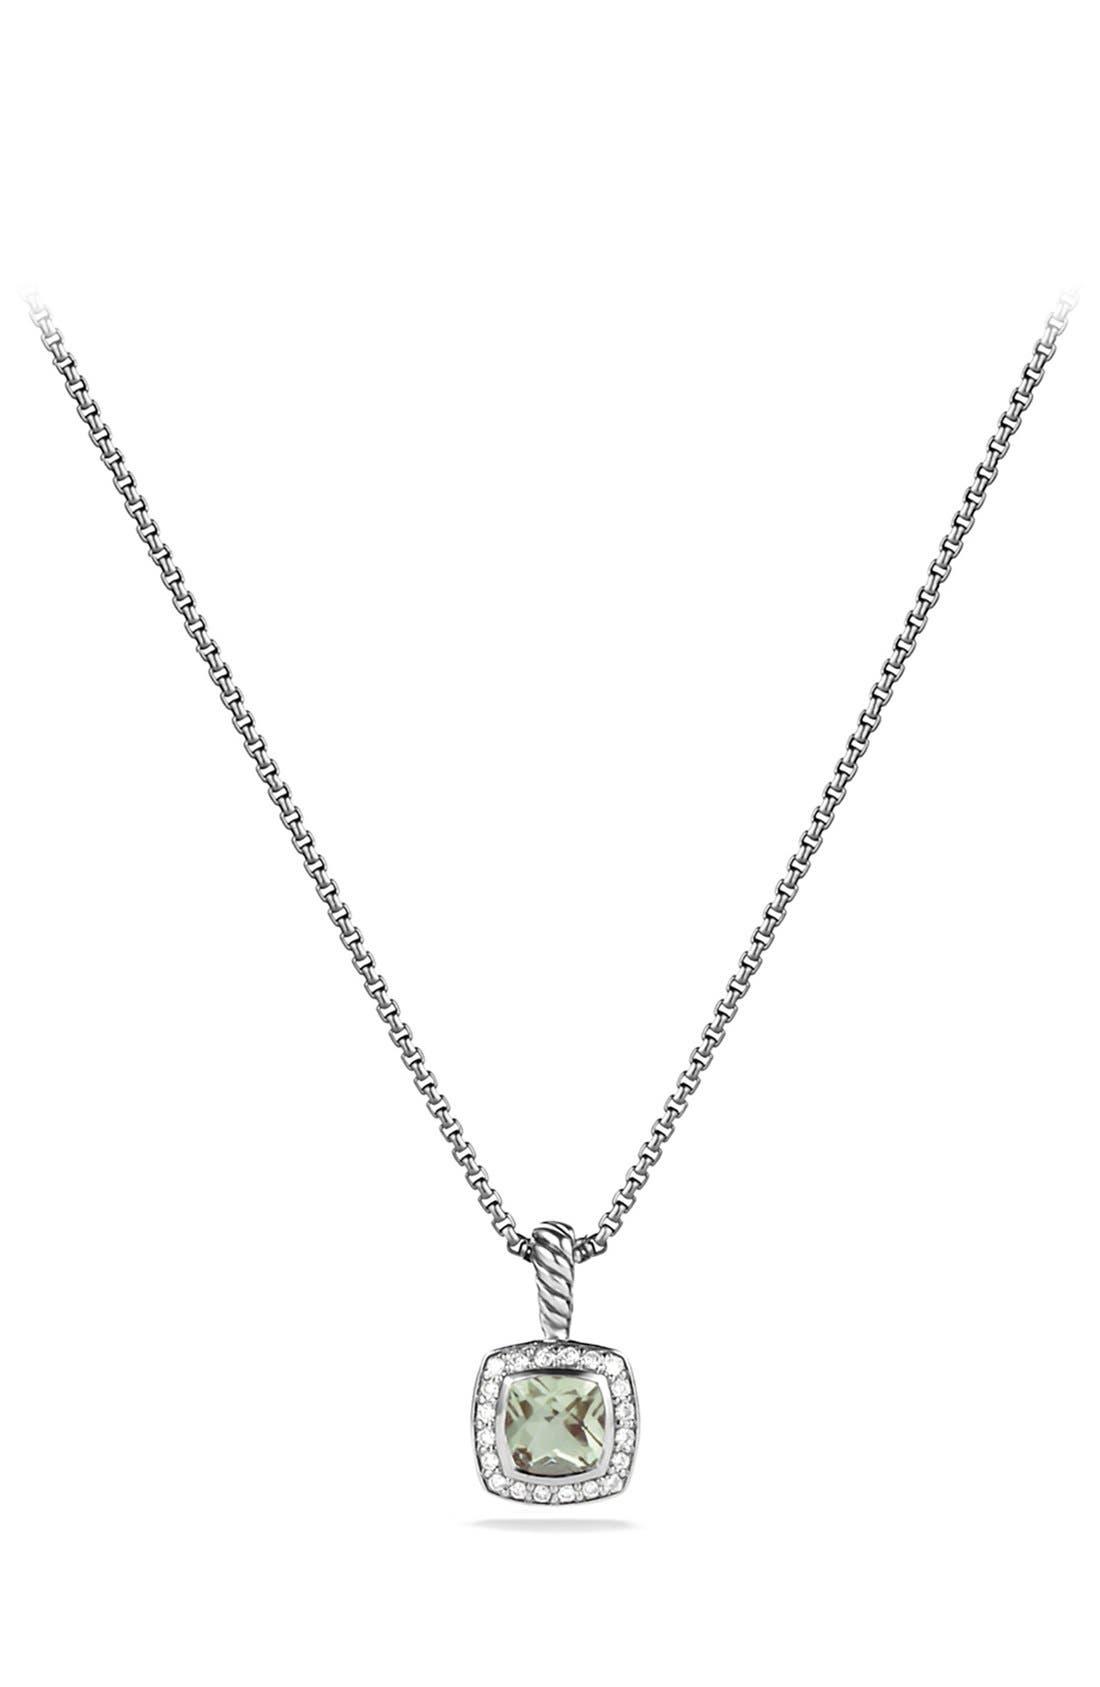 'Albion' Petite Pendant with Prasiolite and Diamonds on Chain,                         Main,                         color, PRASIOLITE